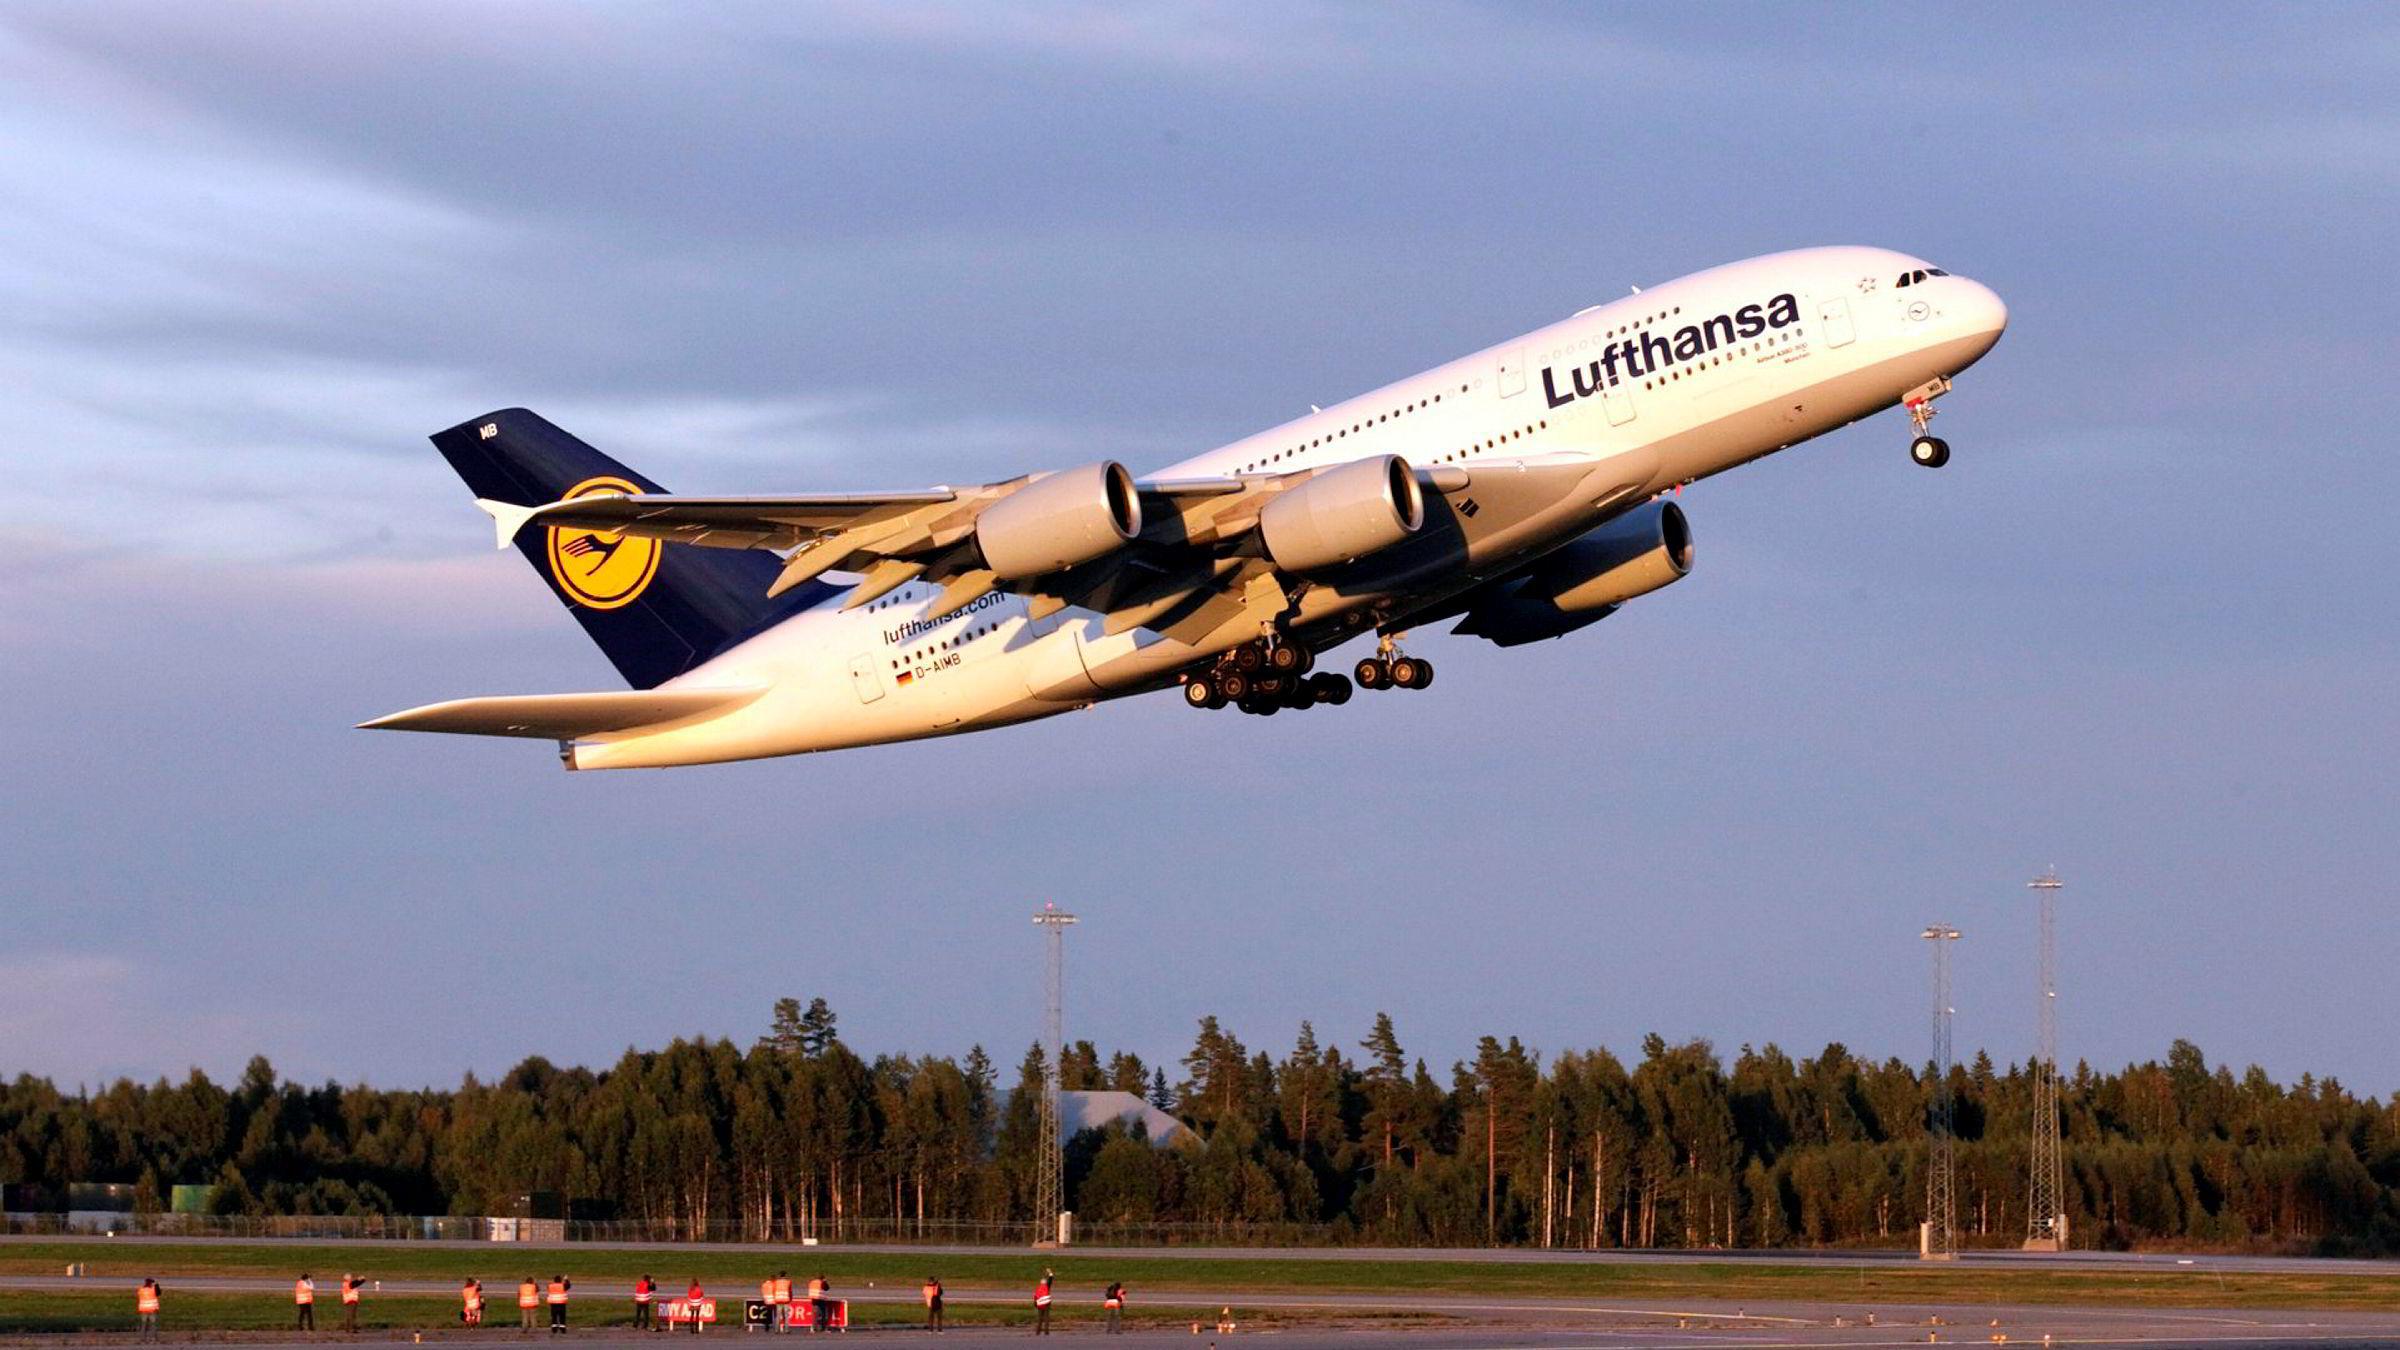 Streiken blant kabinpersonalet i Lufthansa rammer norske passasjerer torsdag og fredag.